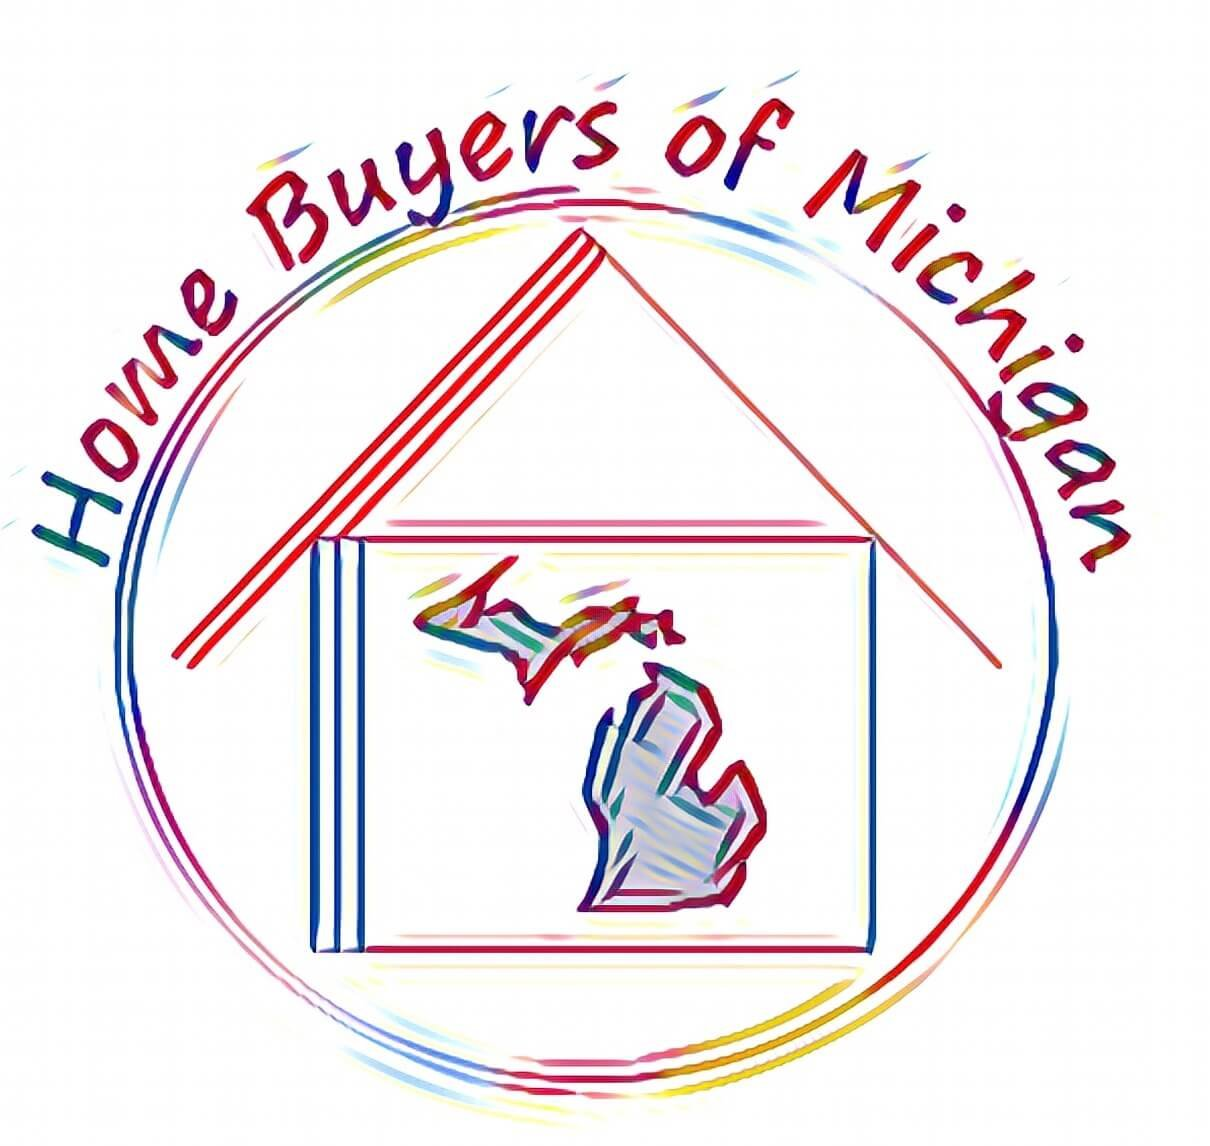 Home Buyers of Michigan logo